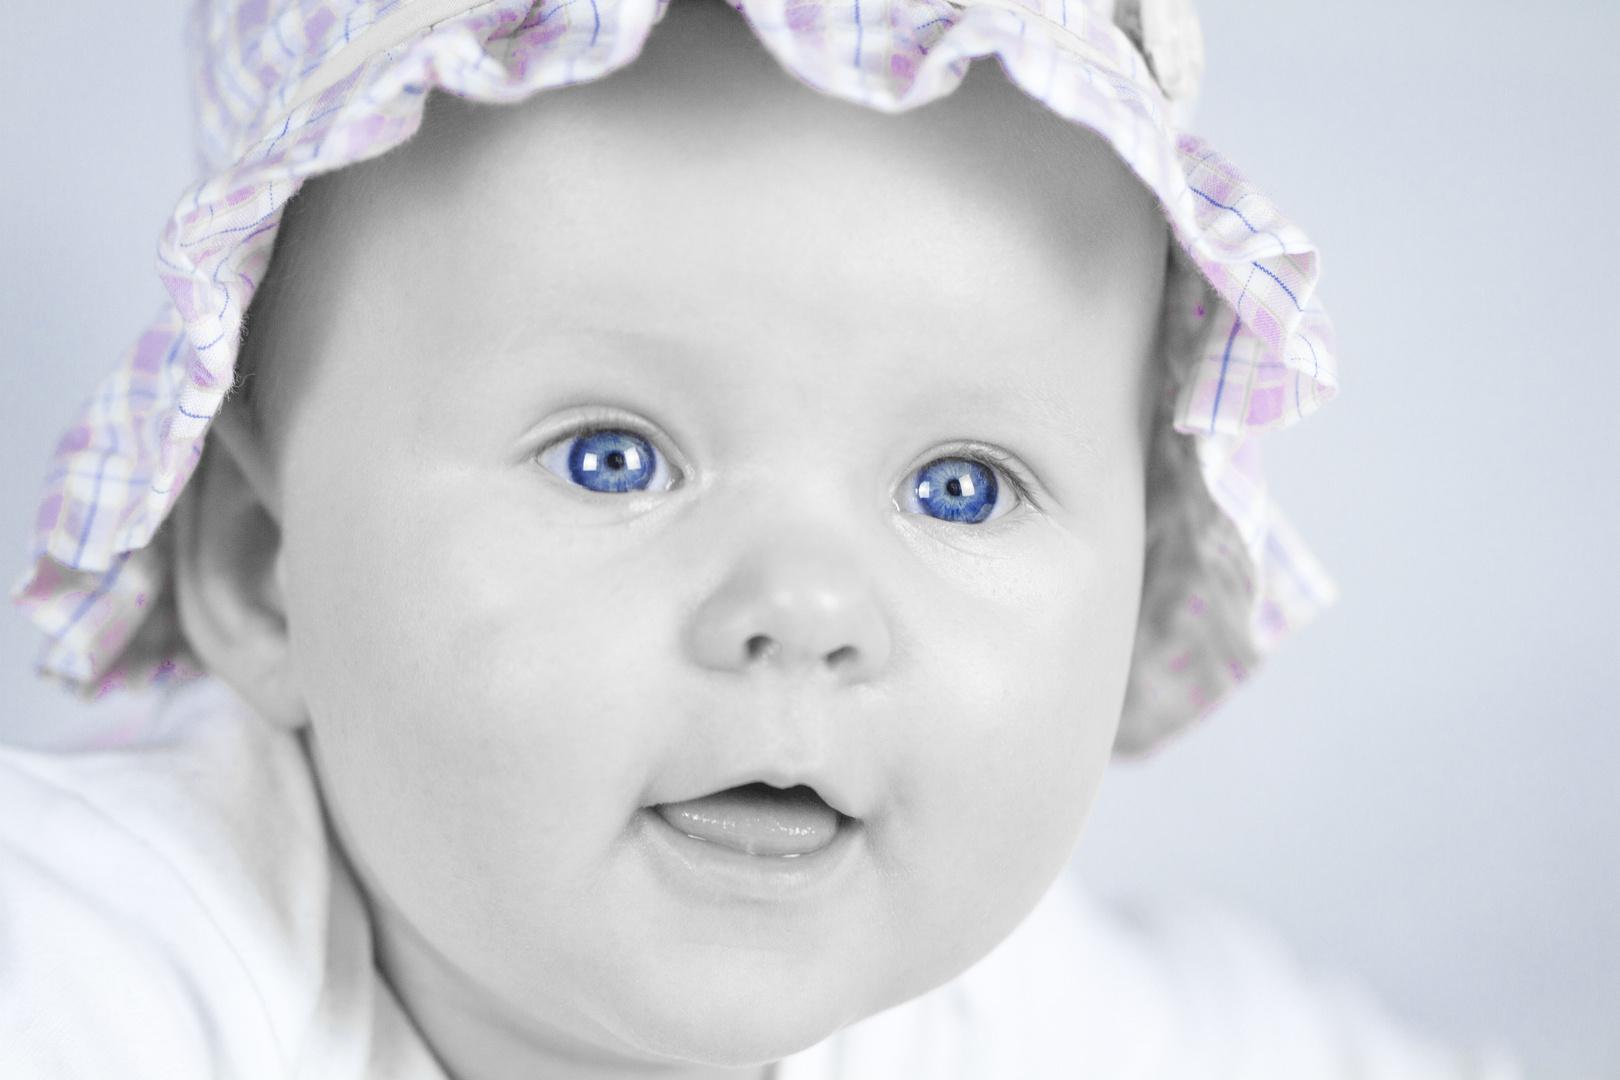 Babyface soft